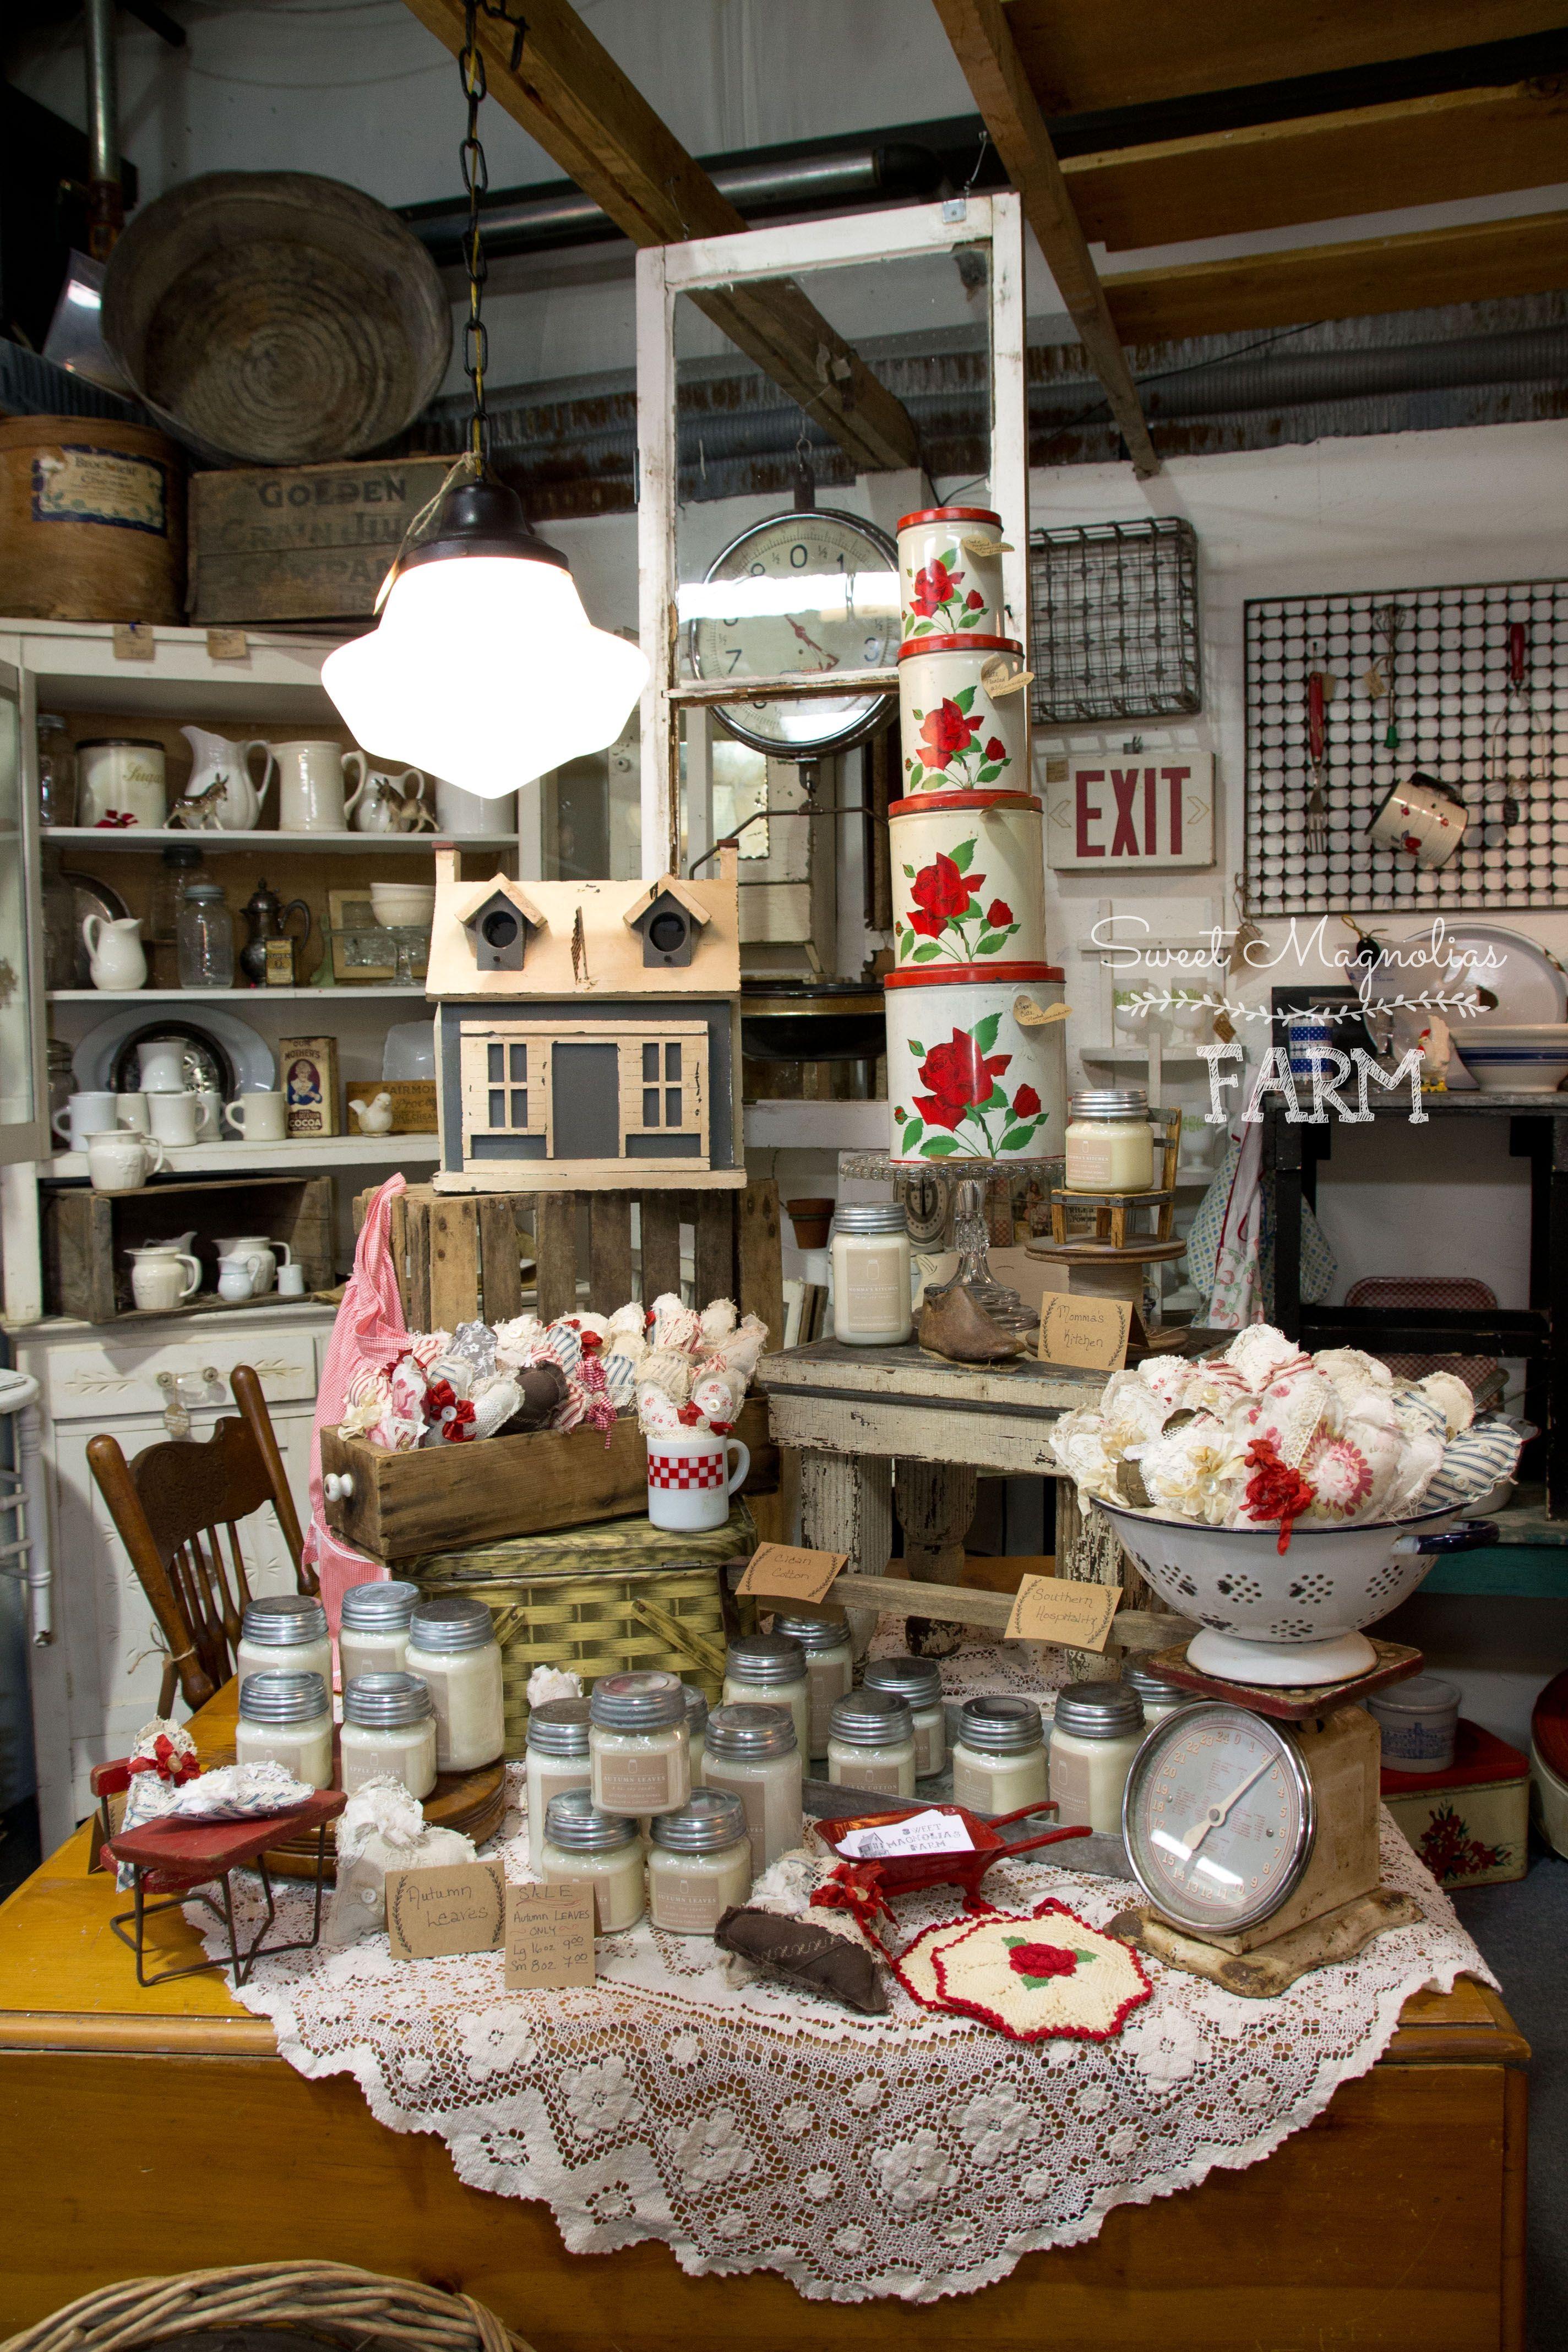 Sweet Magnolias Farm Shop Display Vintage